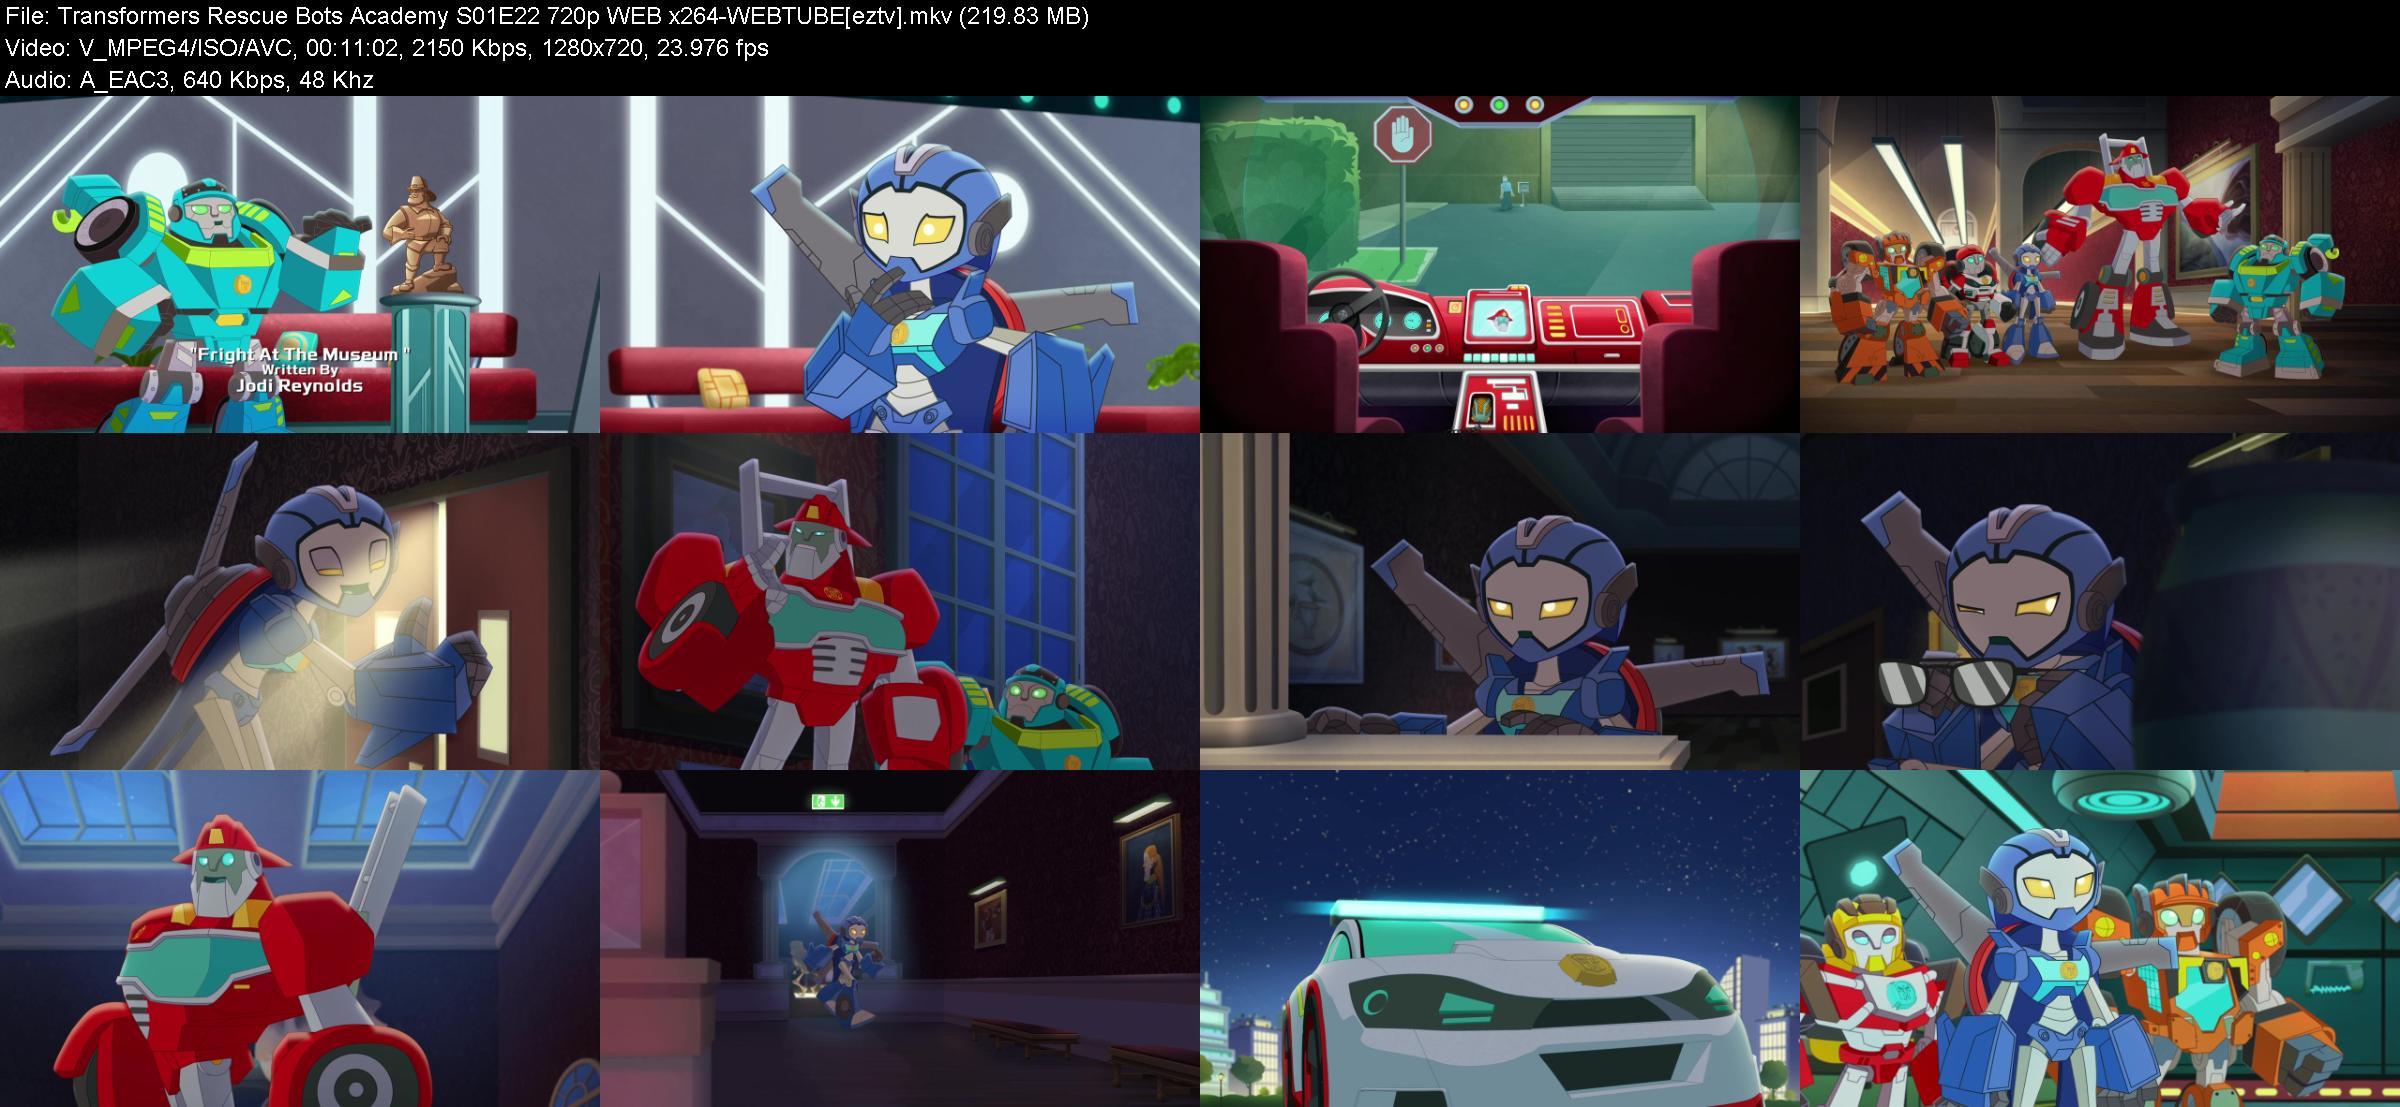 120180473_transformers-rescue-bots-academy-s01e22-720p-web-x264-webtube.jpg